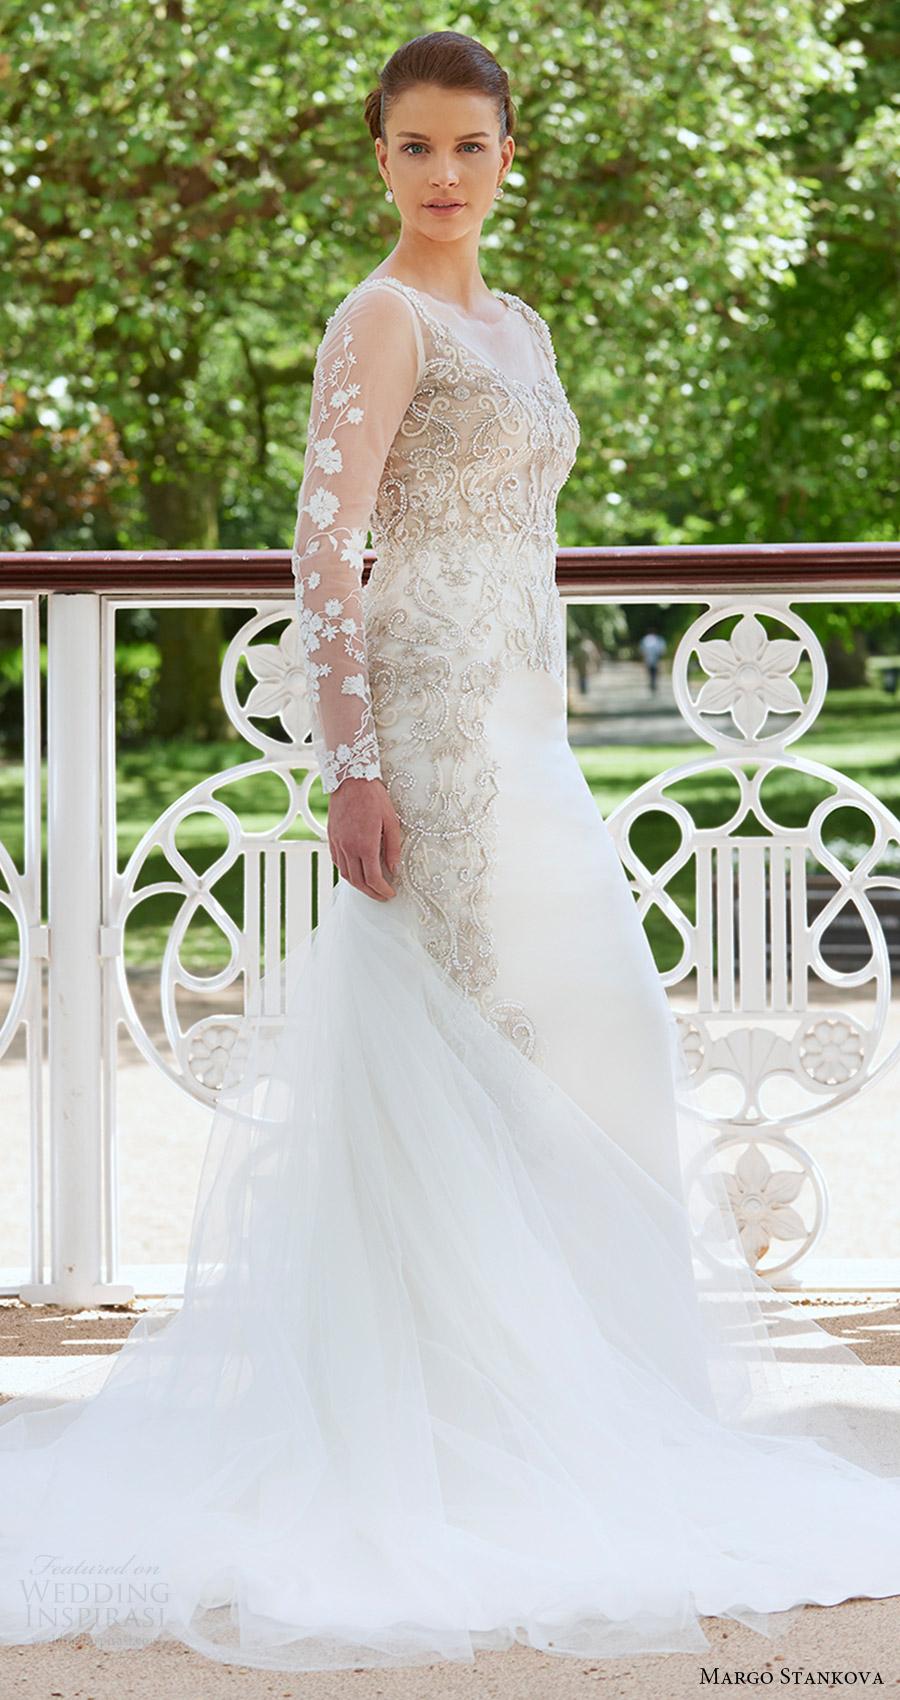 margo stankova bridal 2017 illusion long sleeves beaded bodice trumpet wedding dress (02) sv